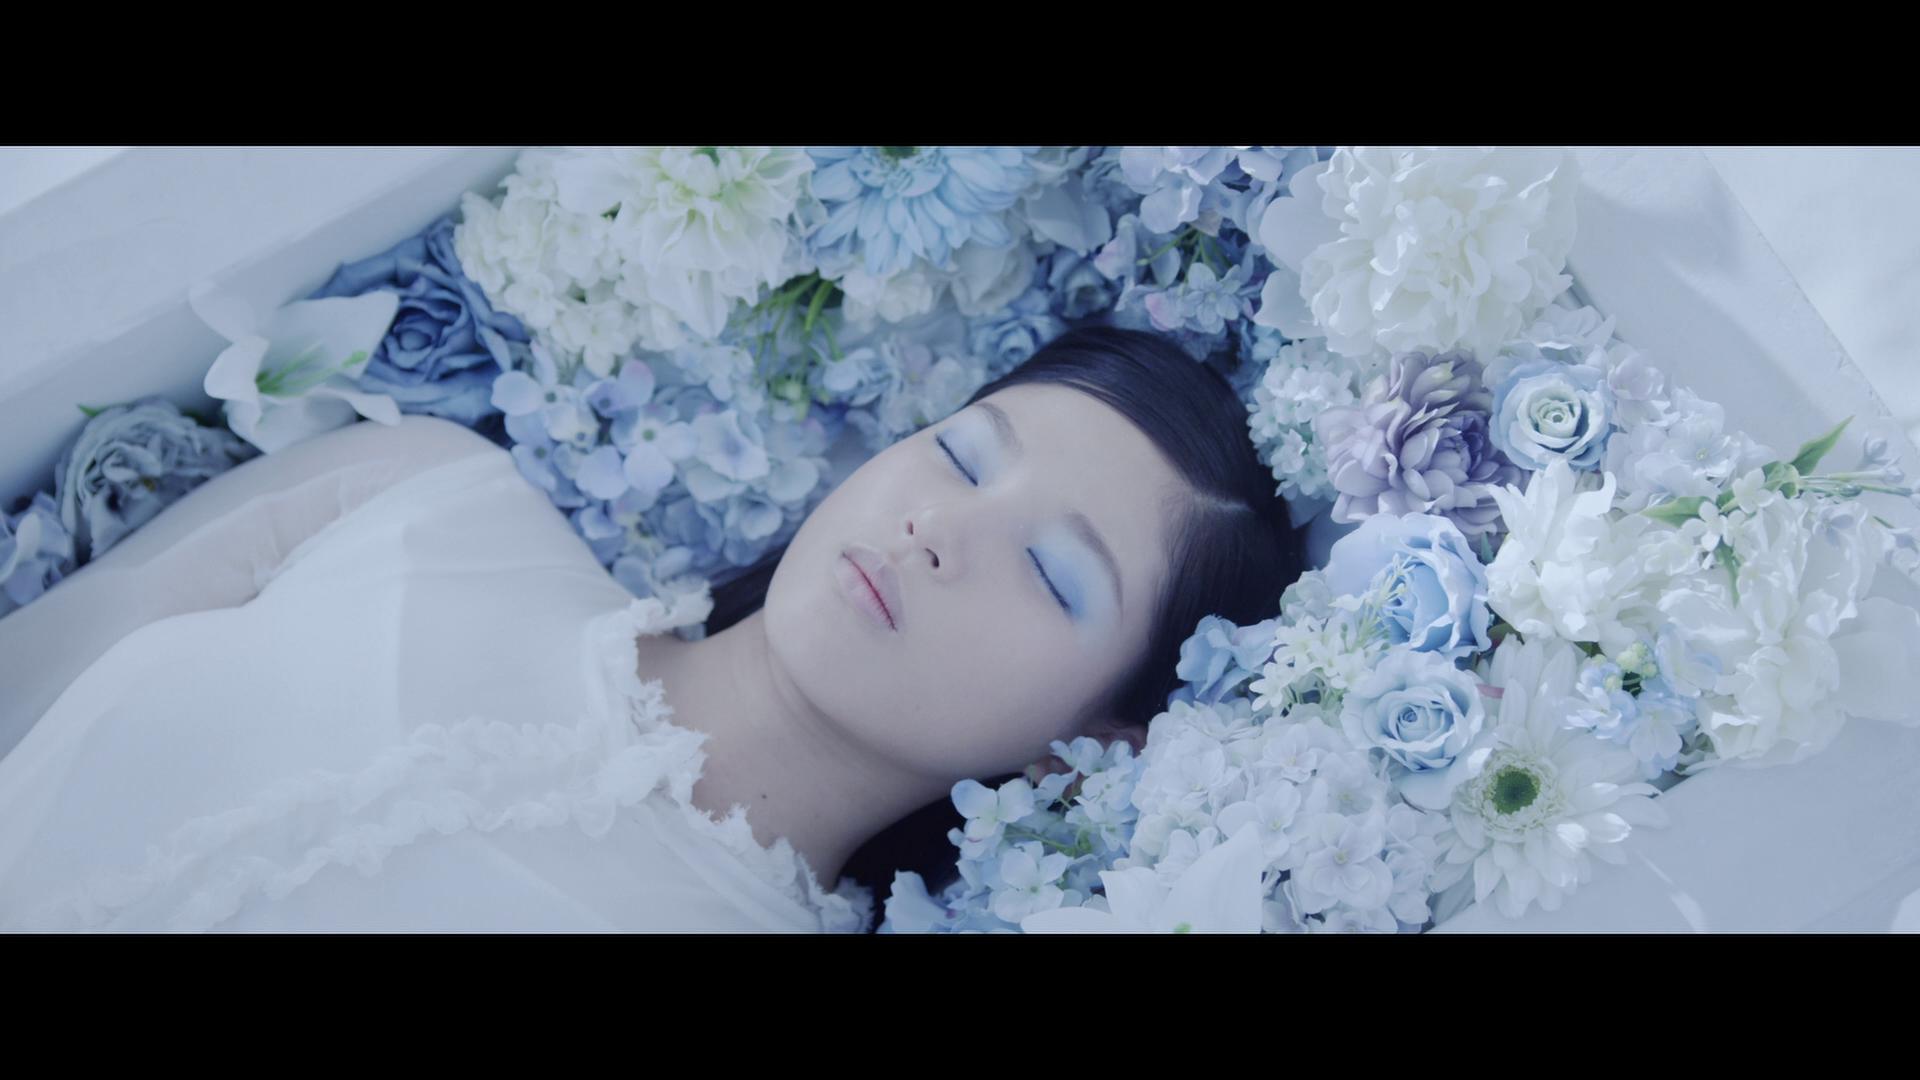 20180812.2303.1 E-girls - Aishiteru to Itte Yokatta (PV) (Blu-Ray) (JPOP.ru).m2ts 1.png